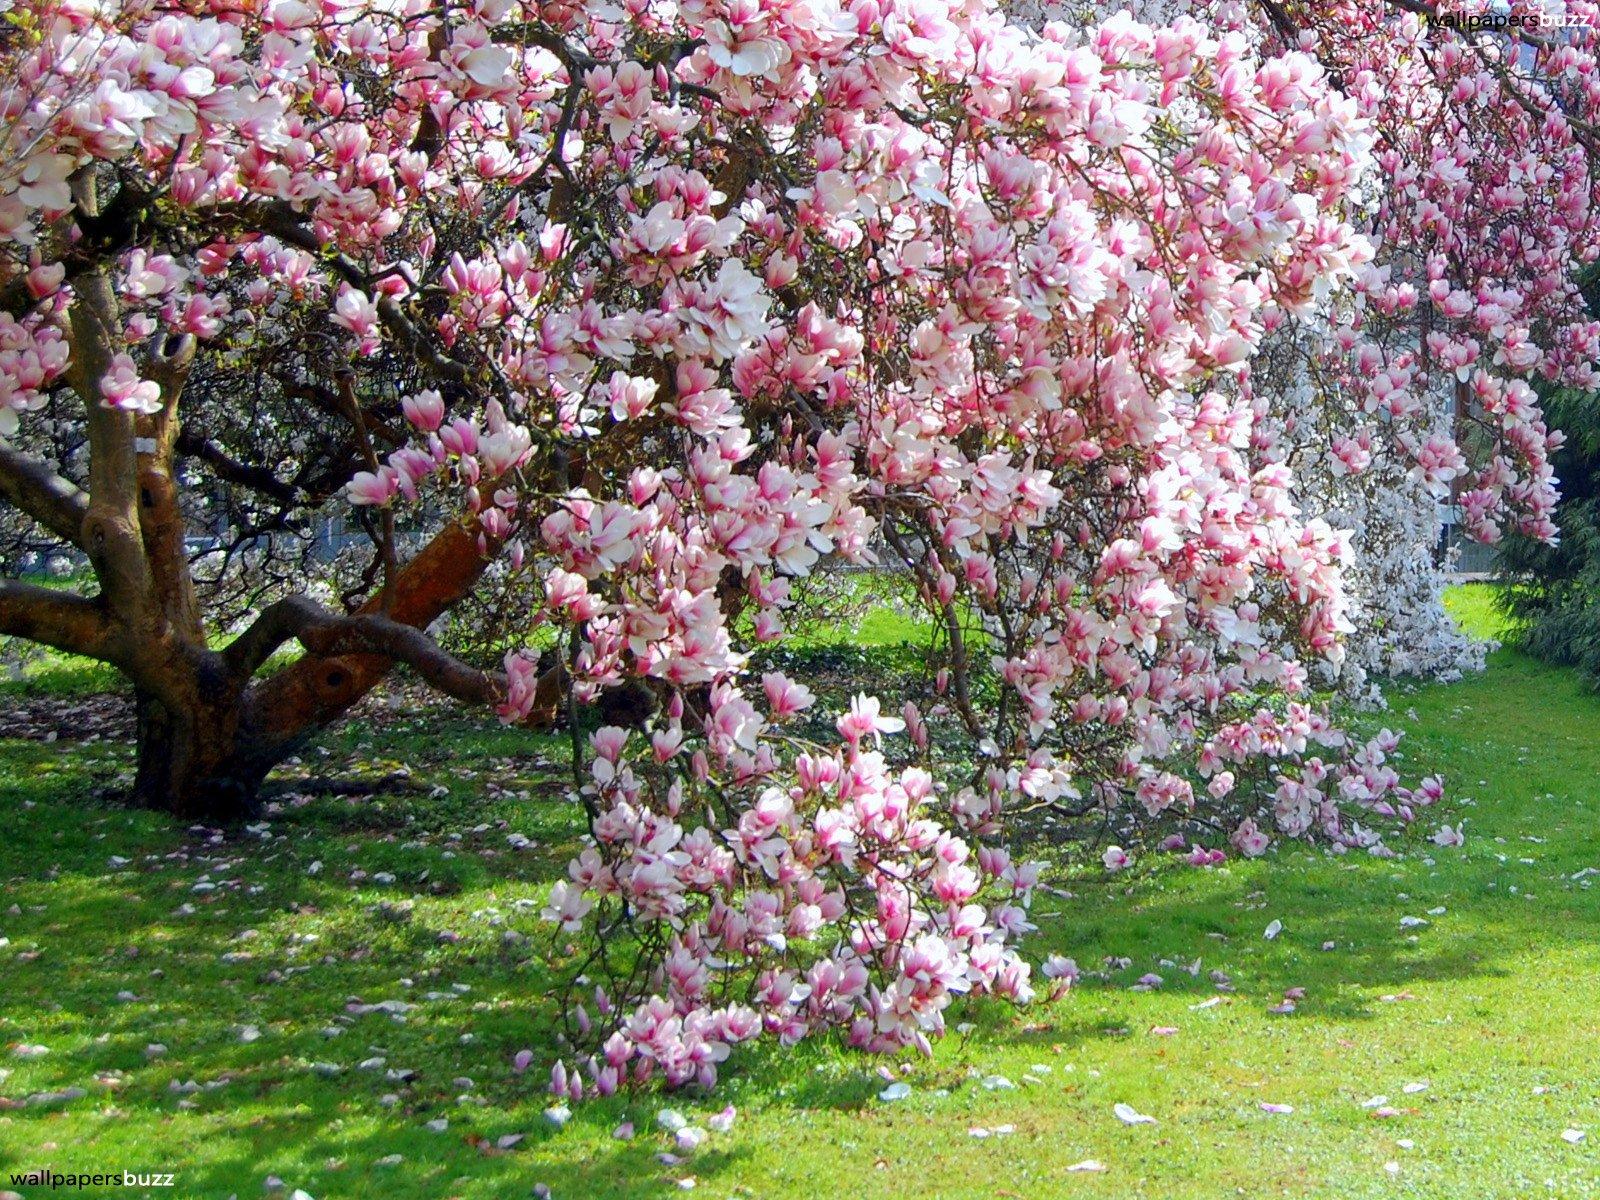 Magnolias | Auntie Dogma's Garden Spot: auntiedogmasgardenspot.wordpress.com/2013/04/13/magnolias